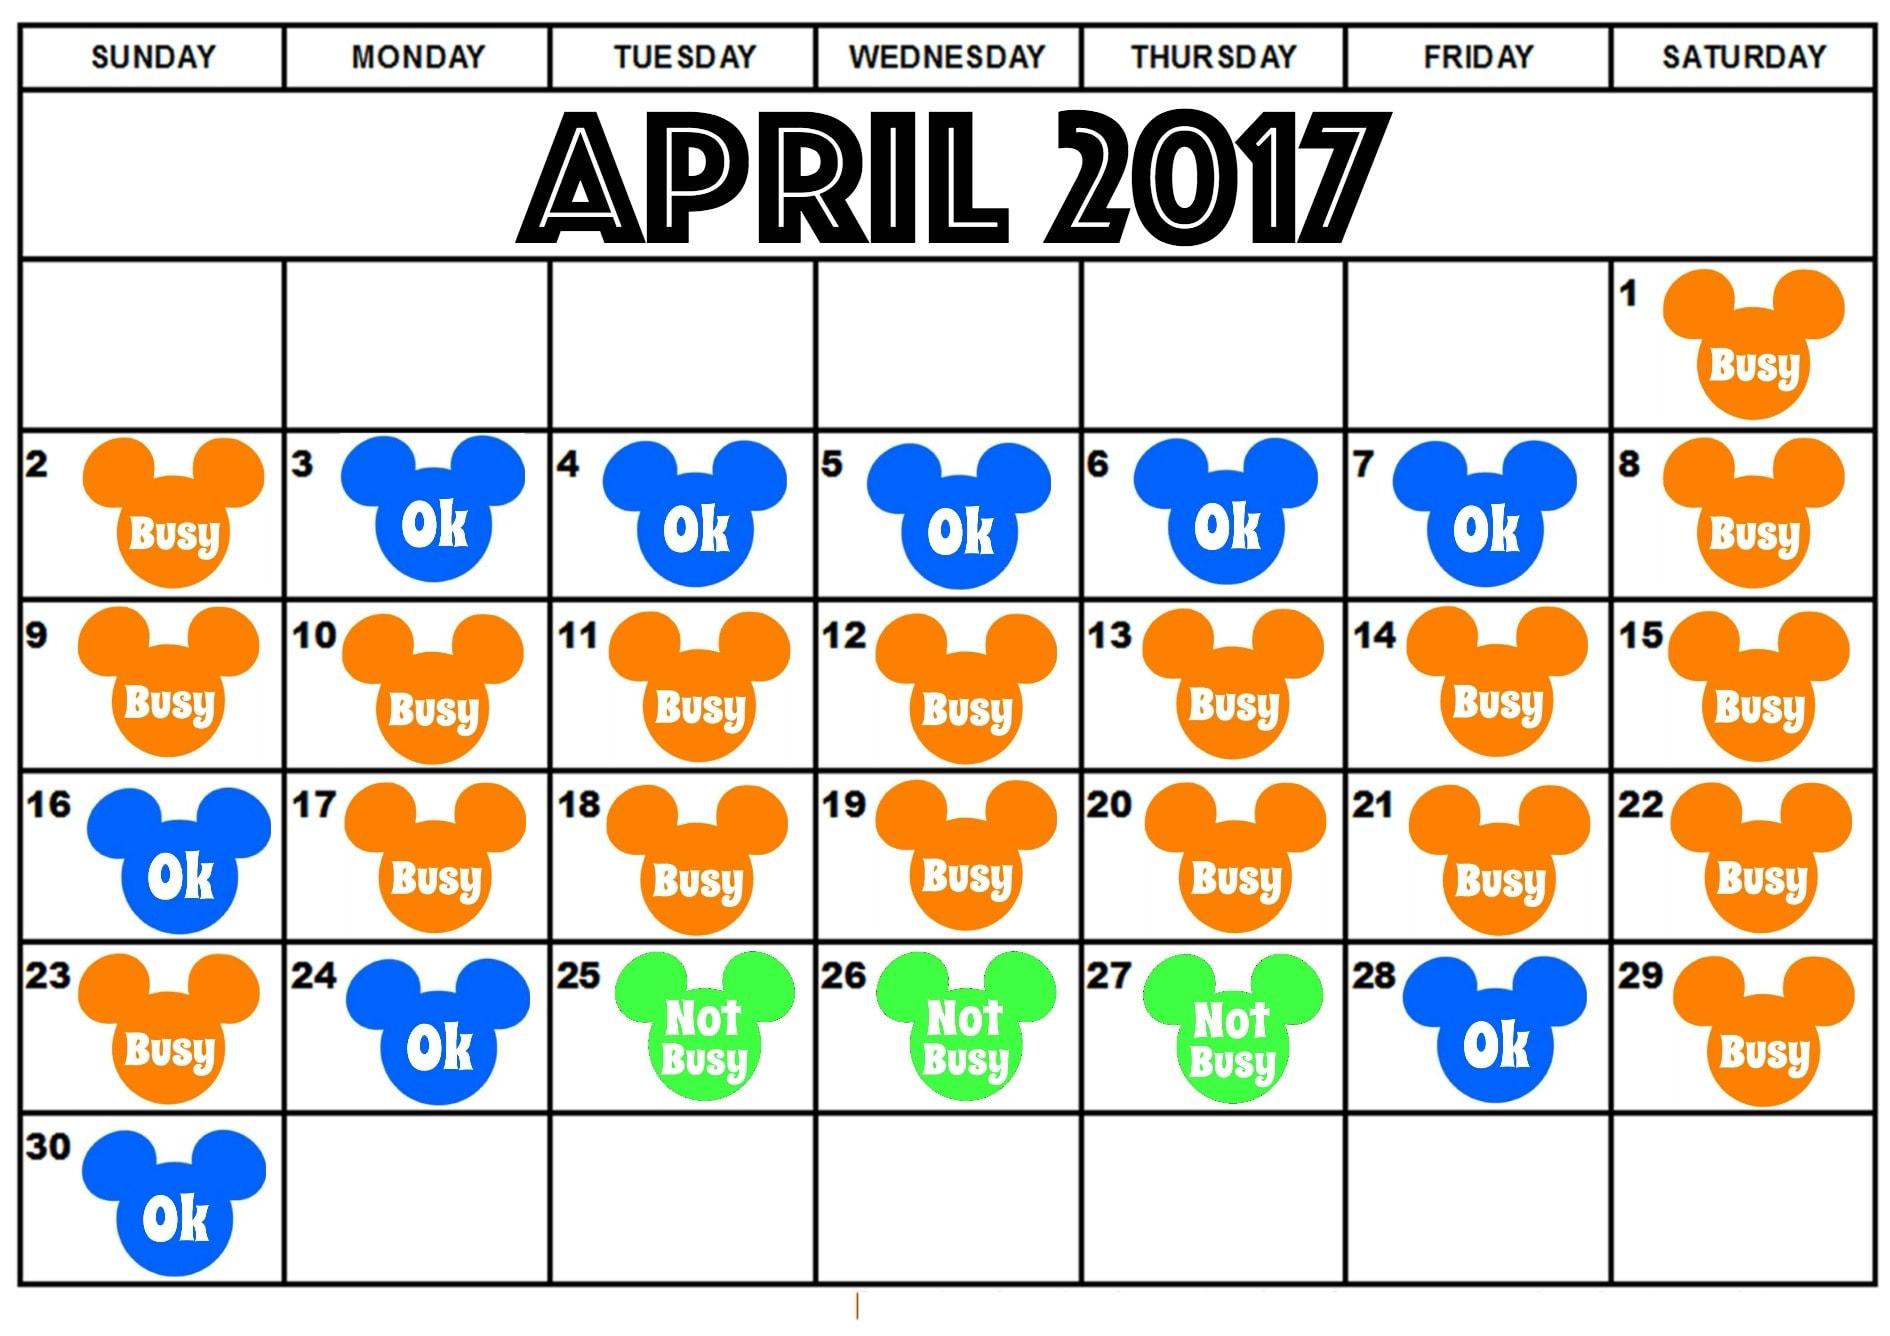 Disneyland April Crowd Calendar